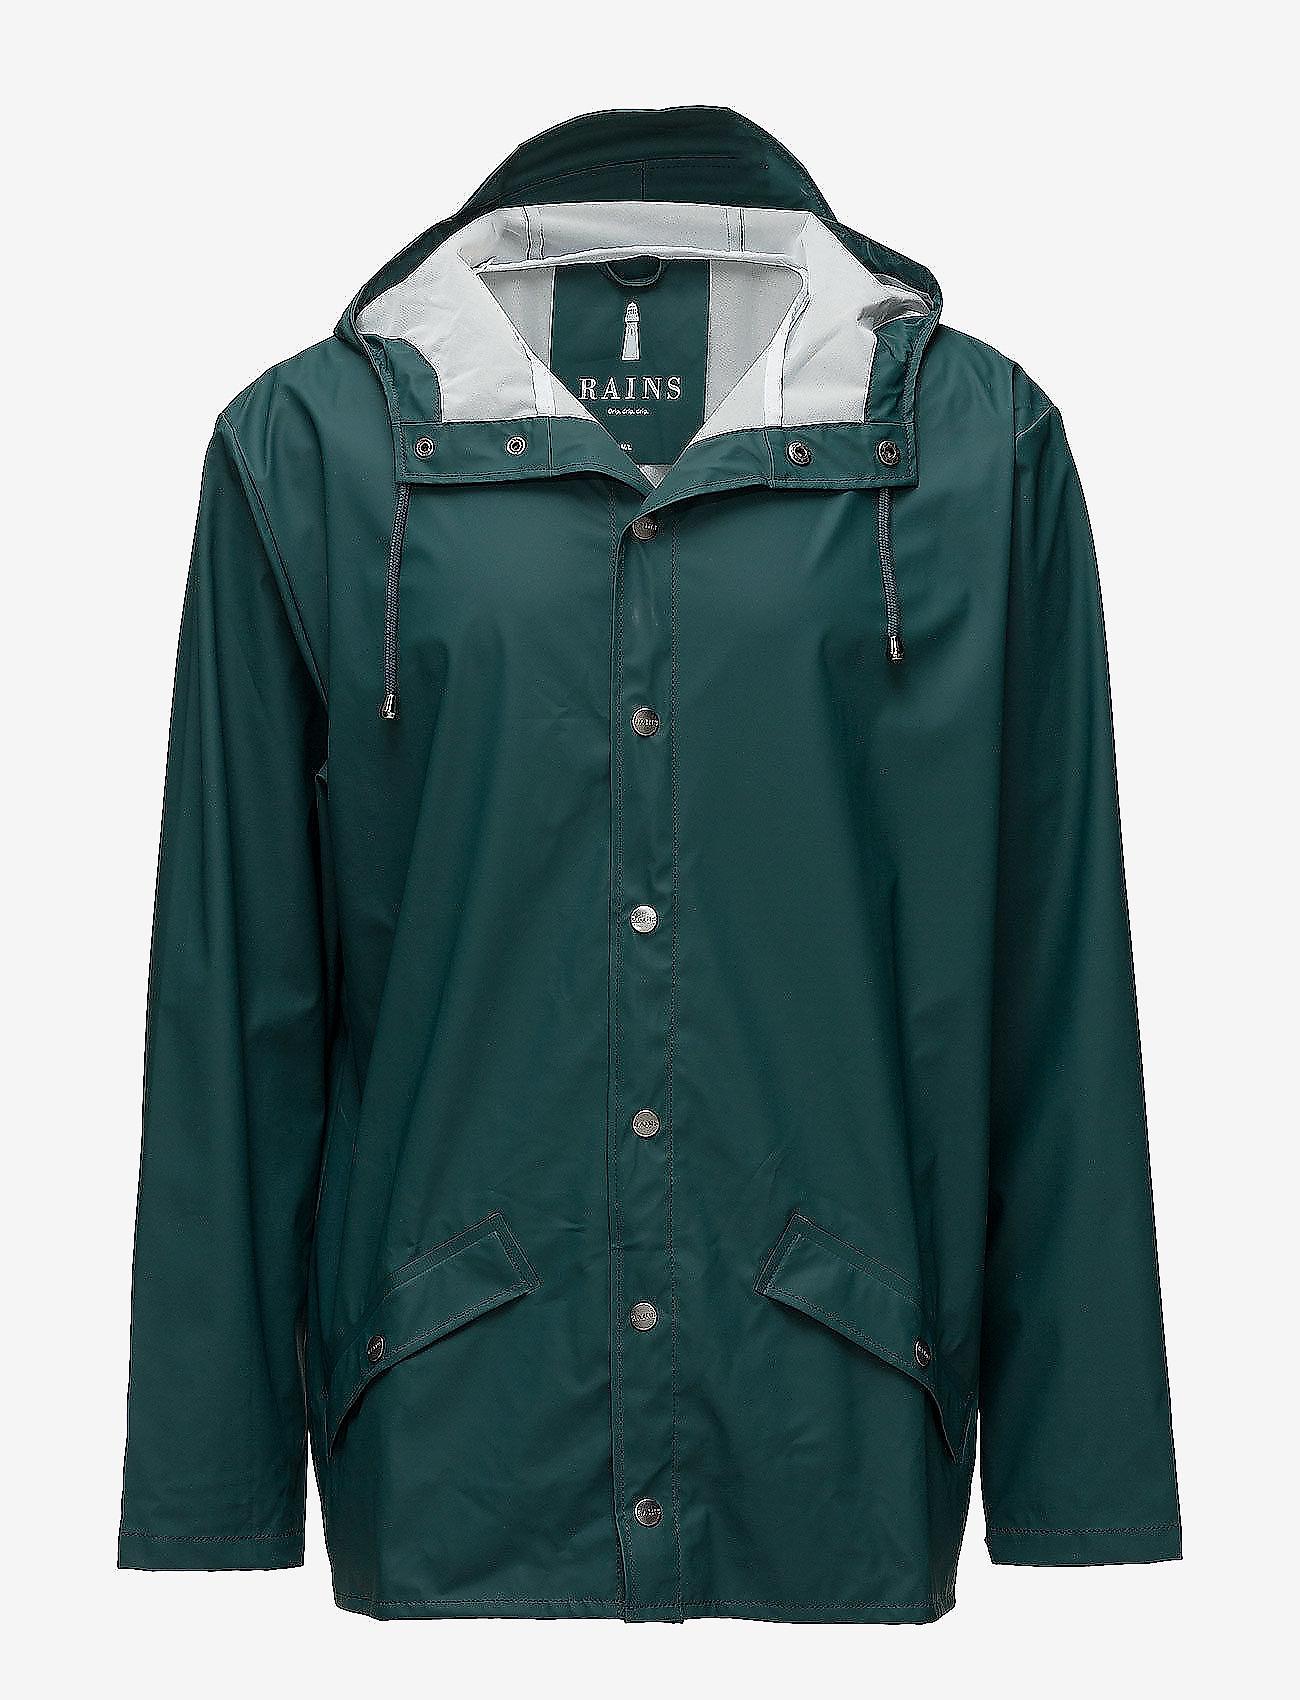 Rains - Jacket - regntøj - 40 dark teal - 0